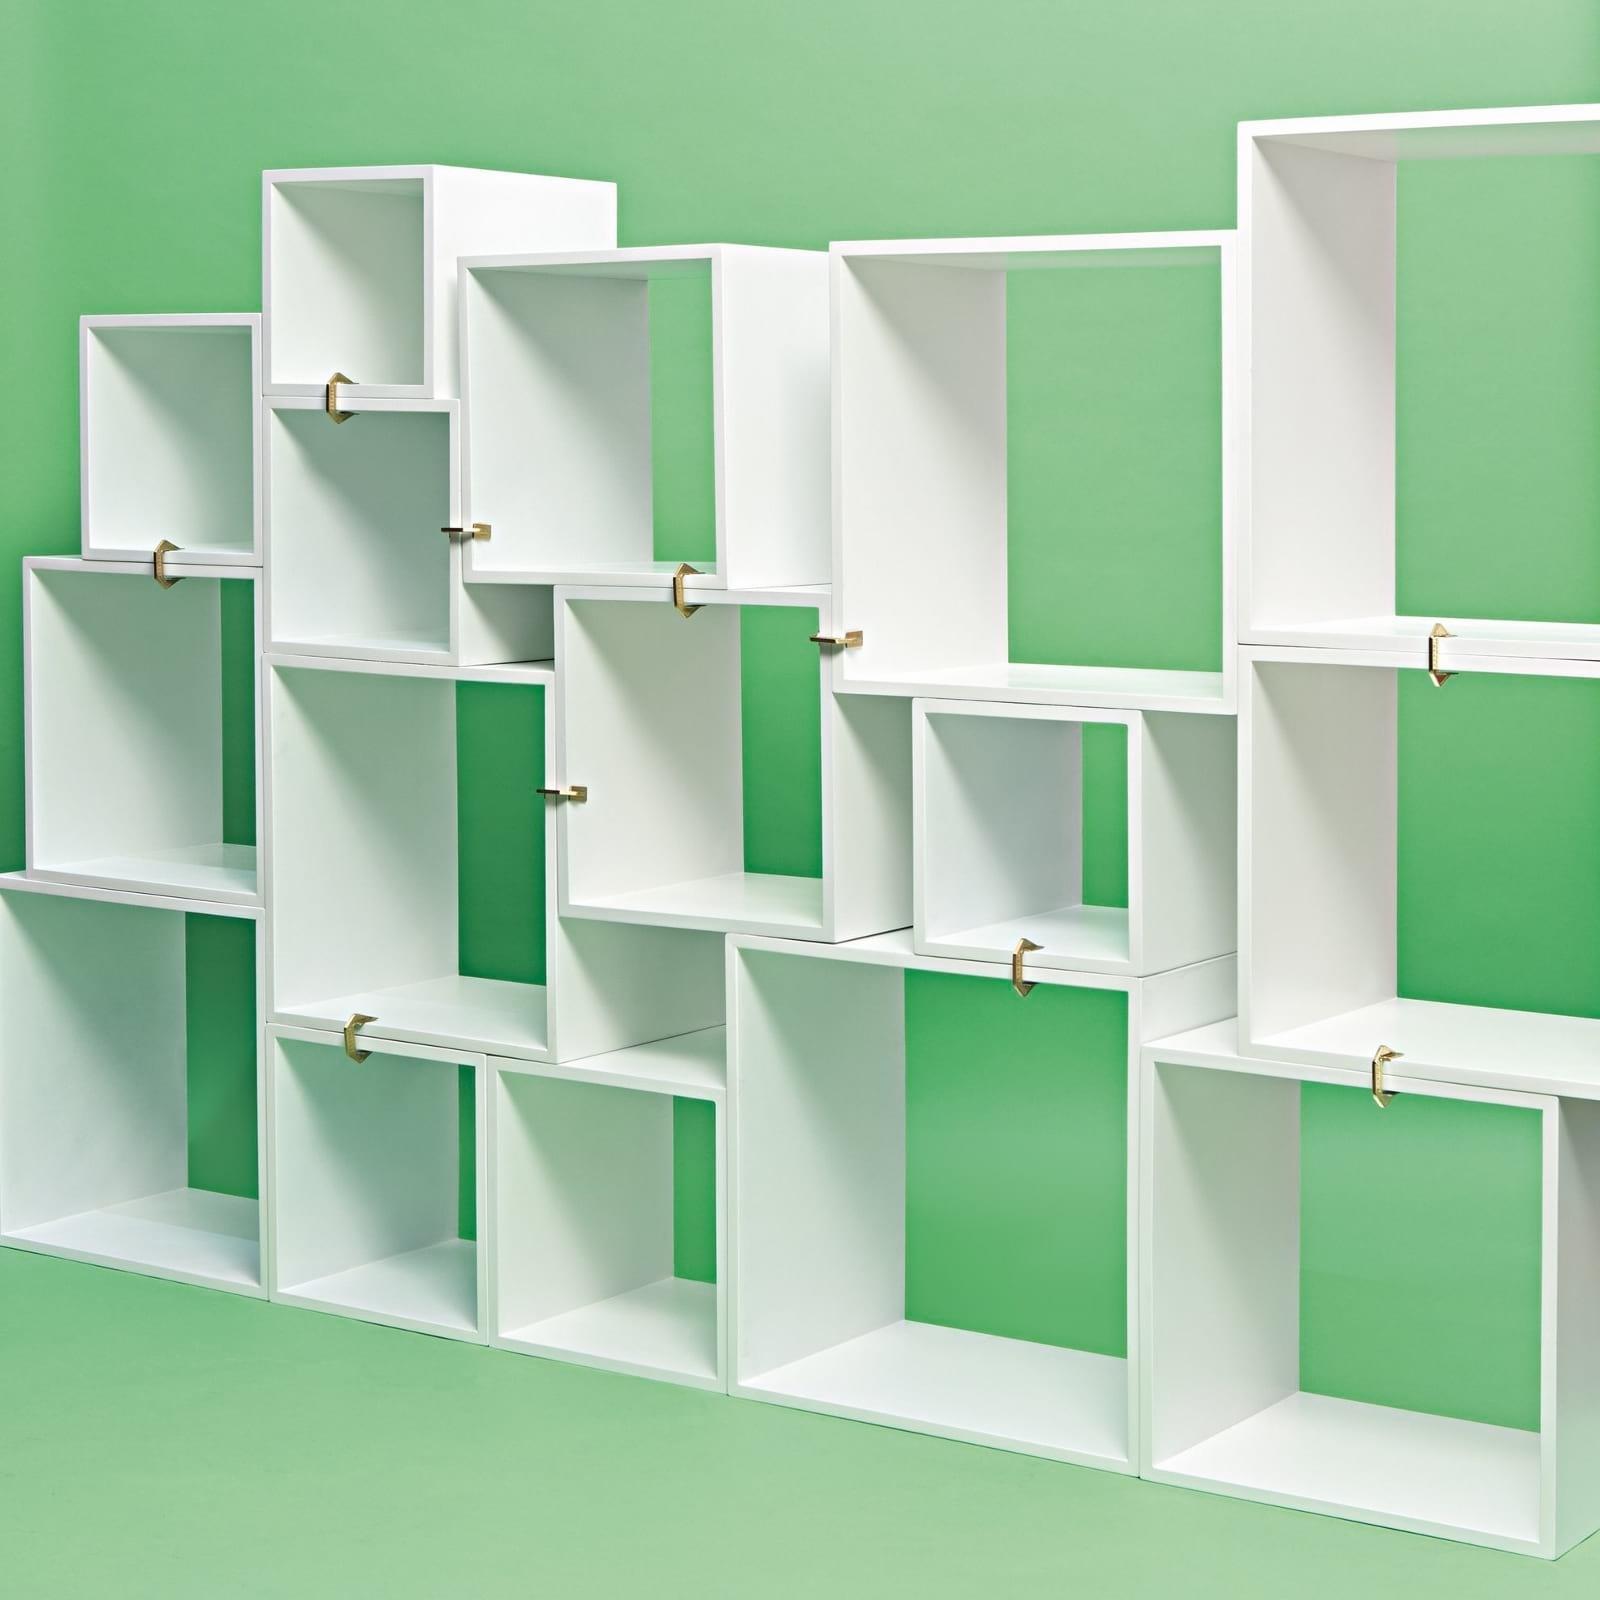 Assemblage Modular Shelving Parisa